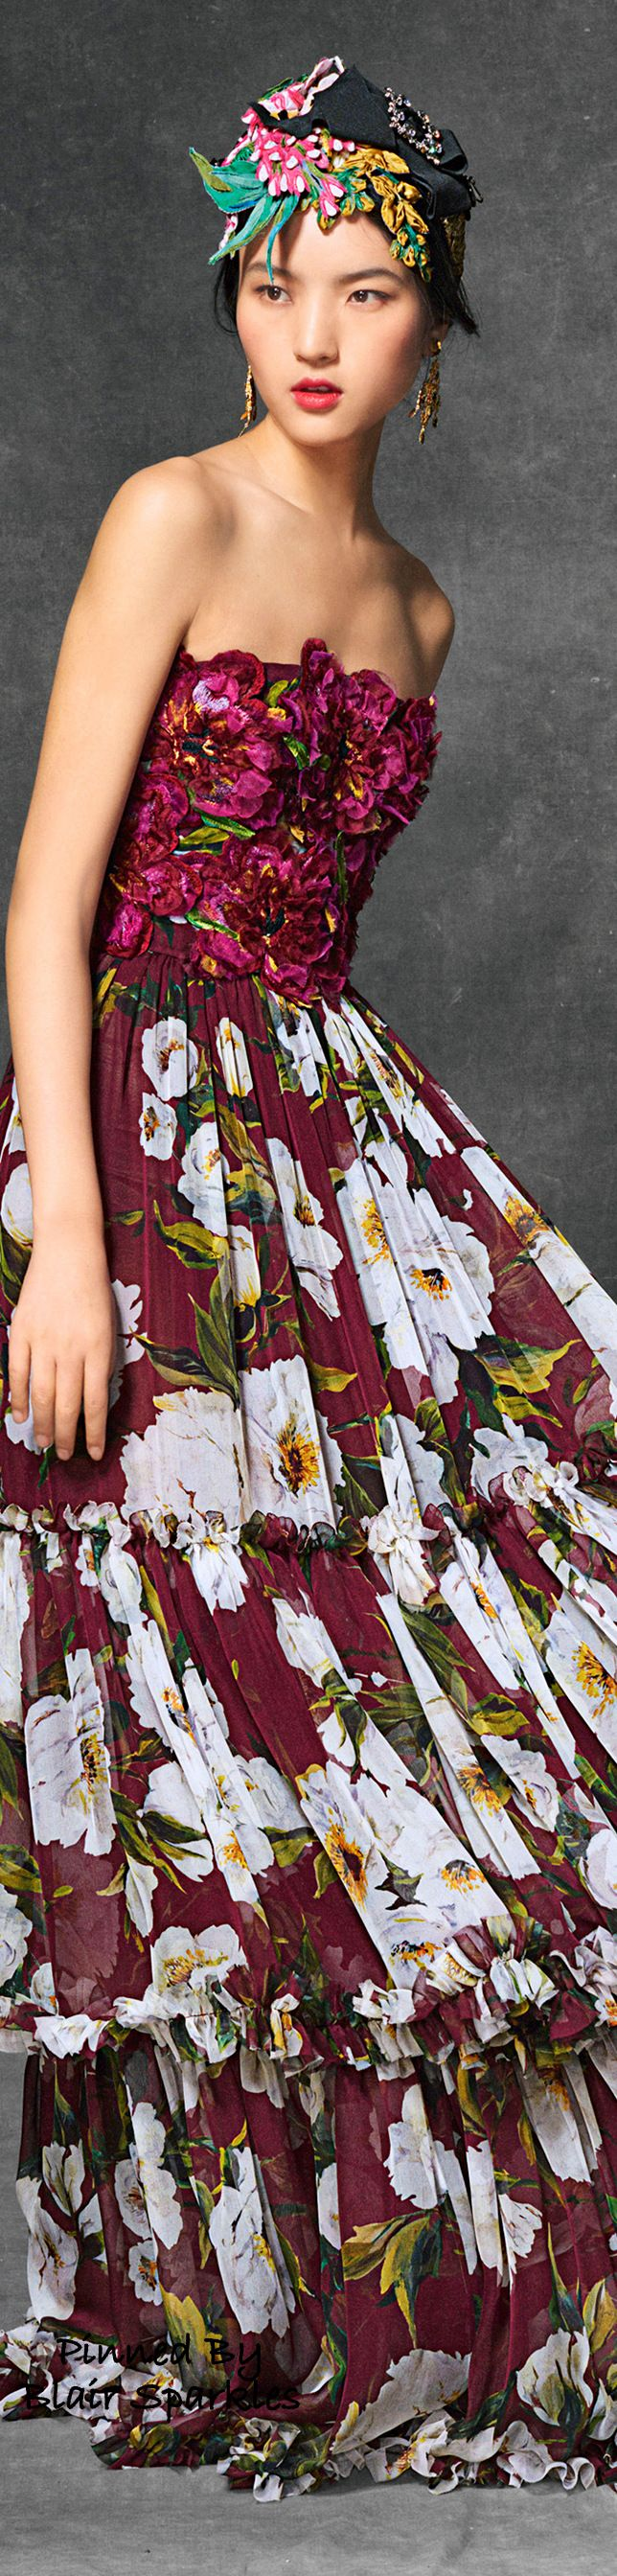 Dolce & Gabbana WINTER 2017 MODERN PRINCESS ~ ♕♚εїз | BLAIR SPARKLES |